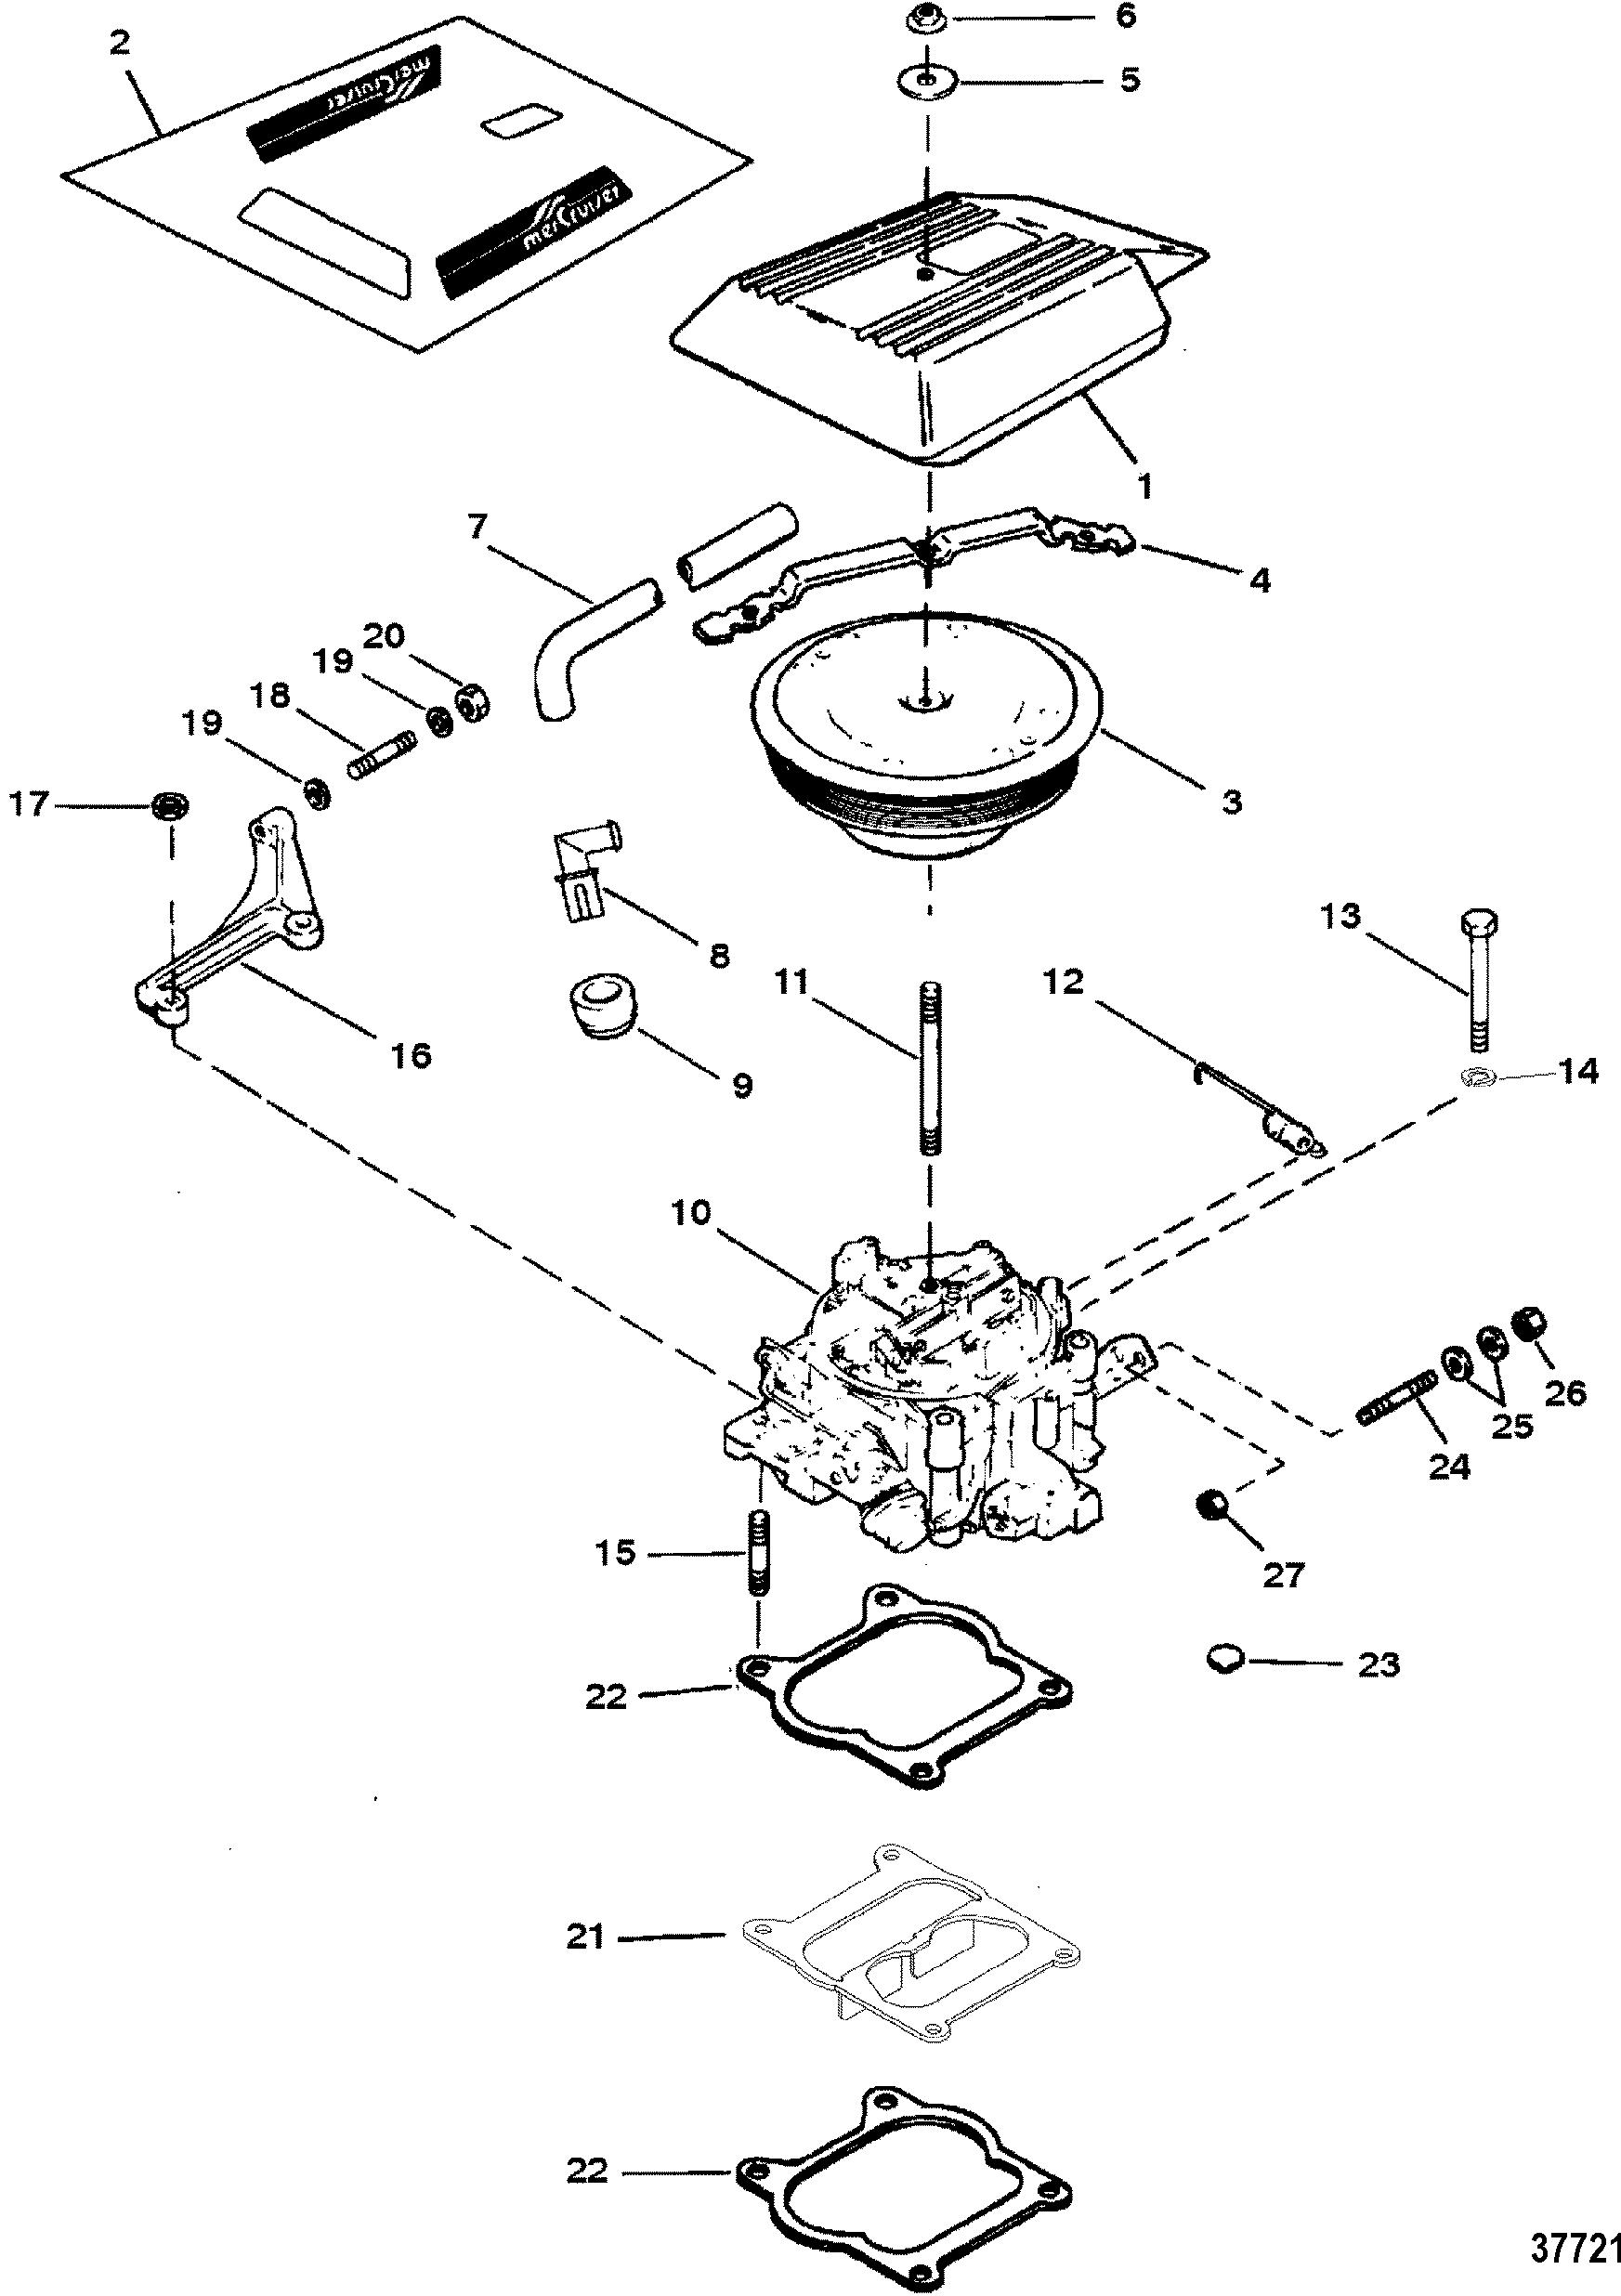 Carburetor Throttle Linkage 4 Barrel For Mercruiser 5 7l Lx 350 Mag Alpha Bravo